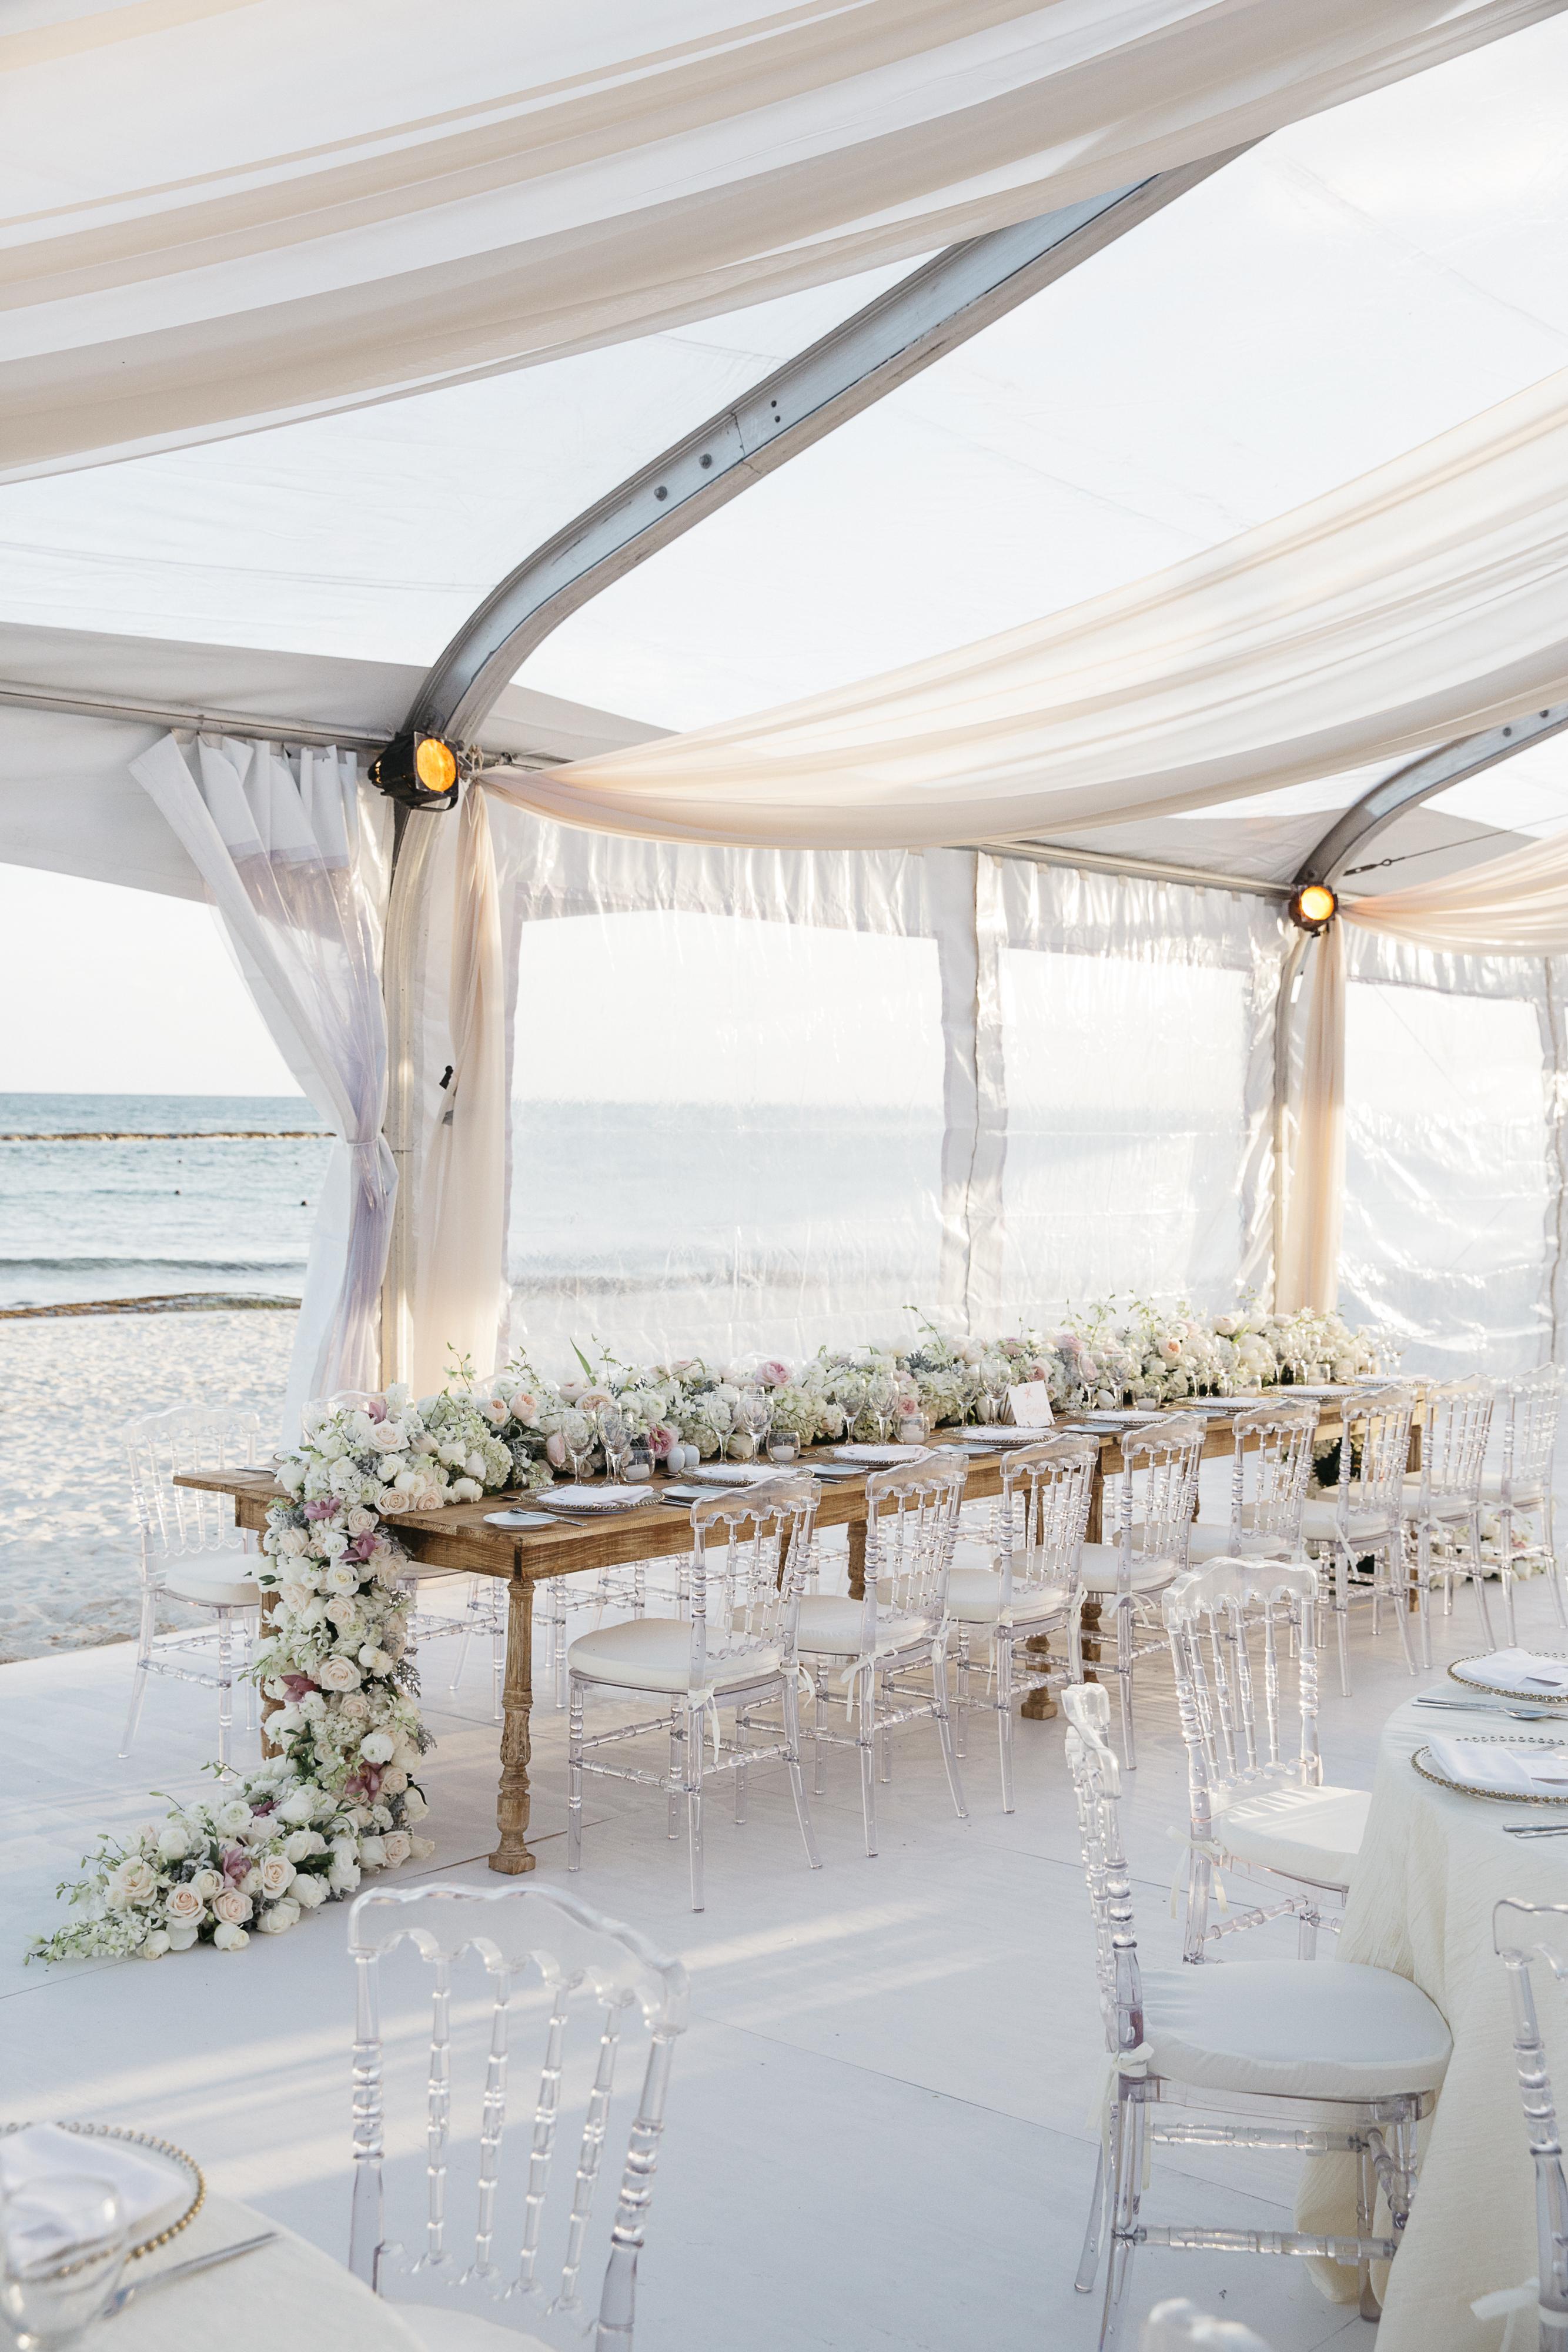 Beachside Destination Wedding in Mexico's Riviera Maya - DFW Events, Inc.